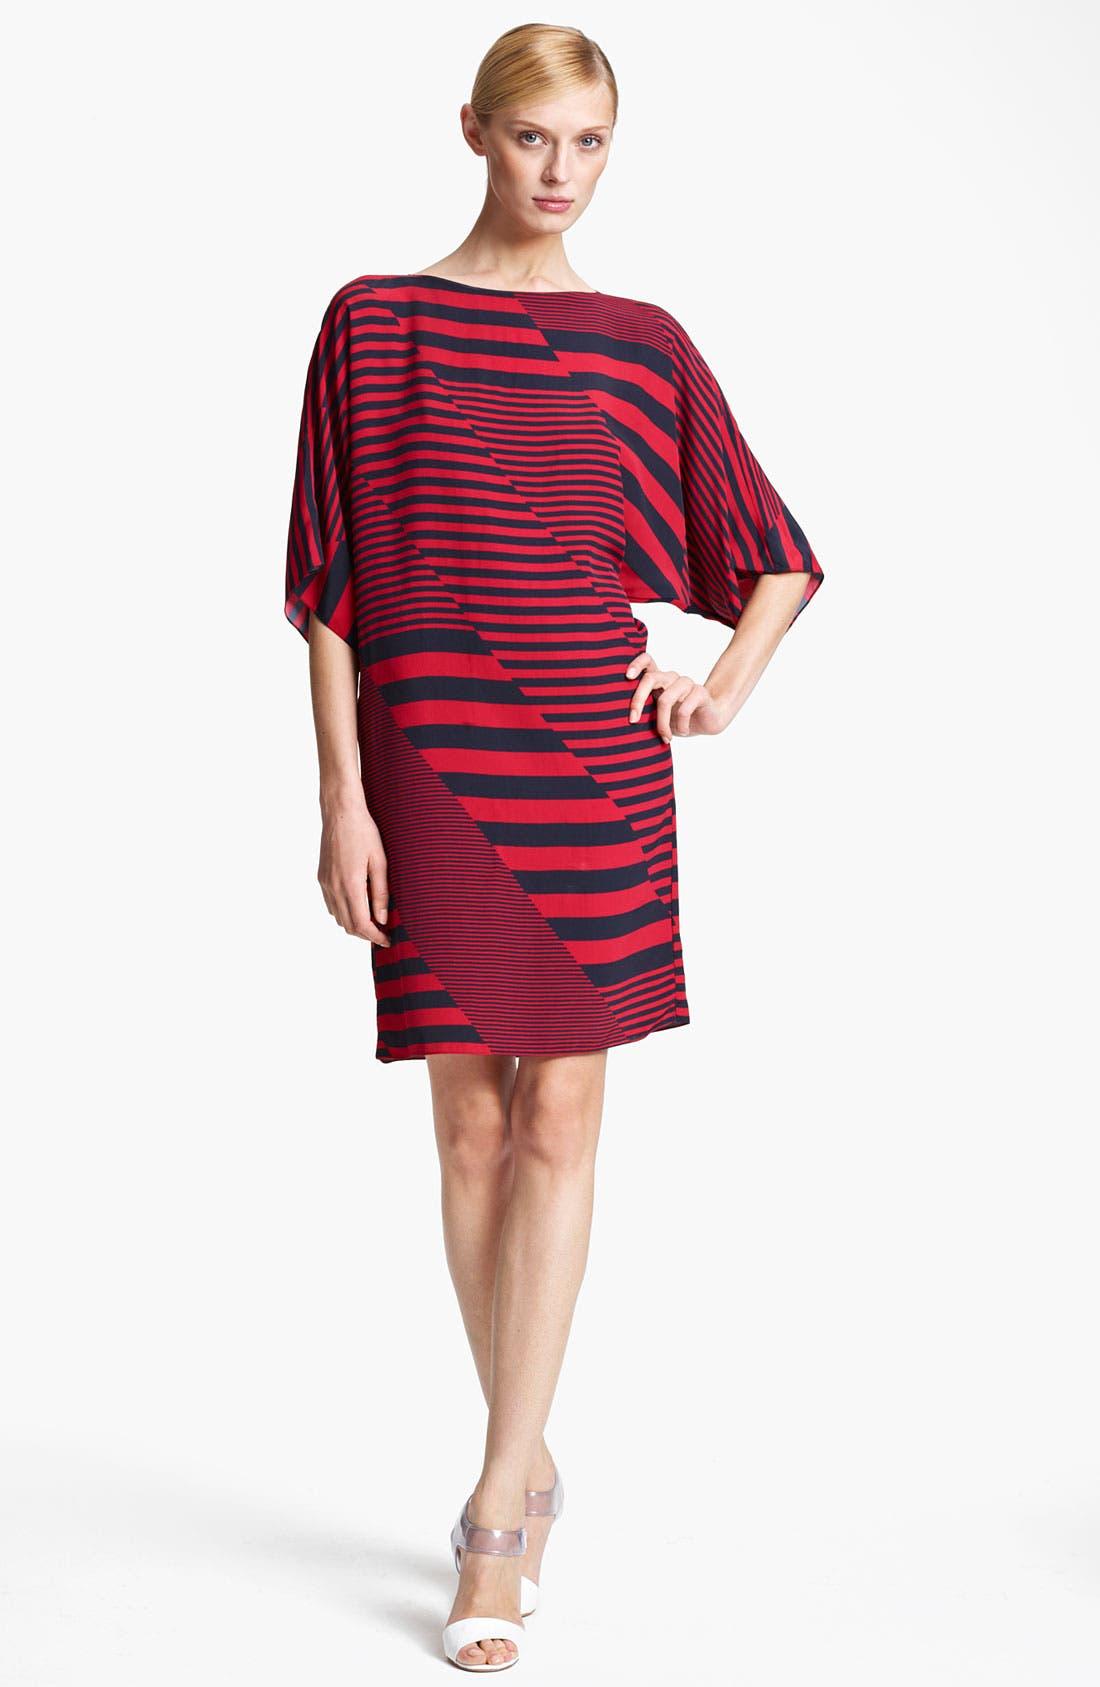 Alternate Image 1 Selected - Michael Kors Stripe Print Marocain Dress